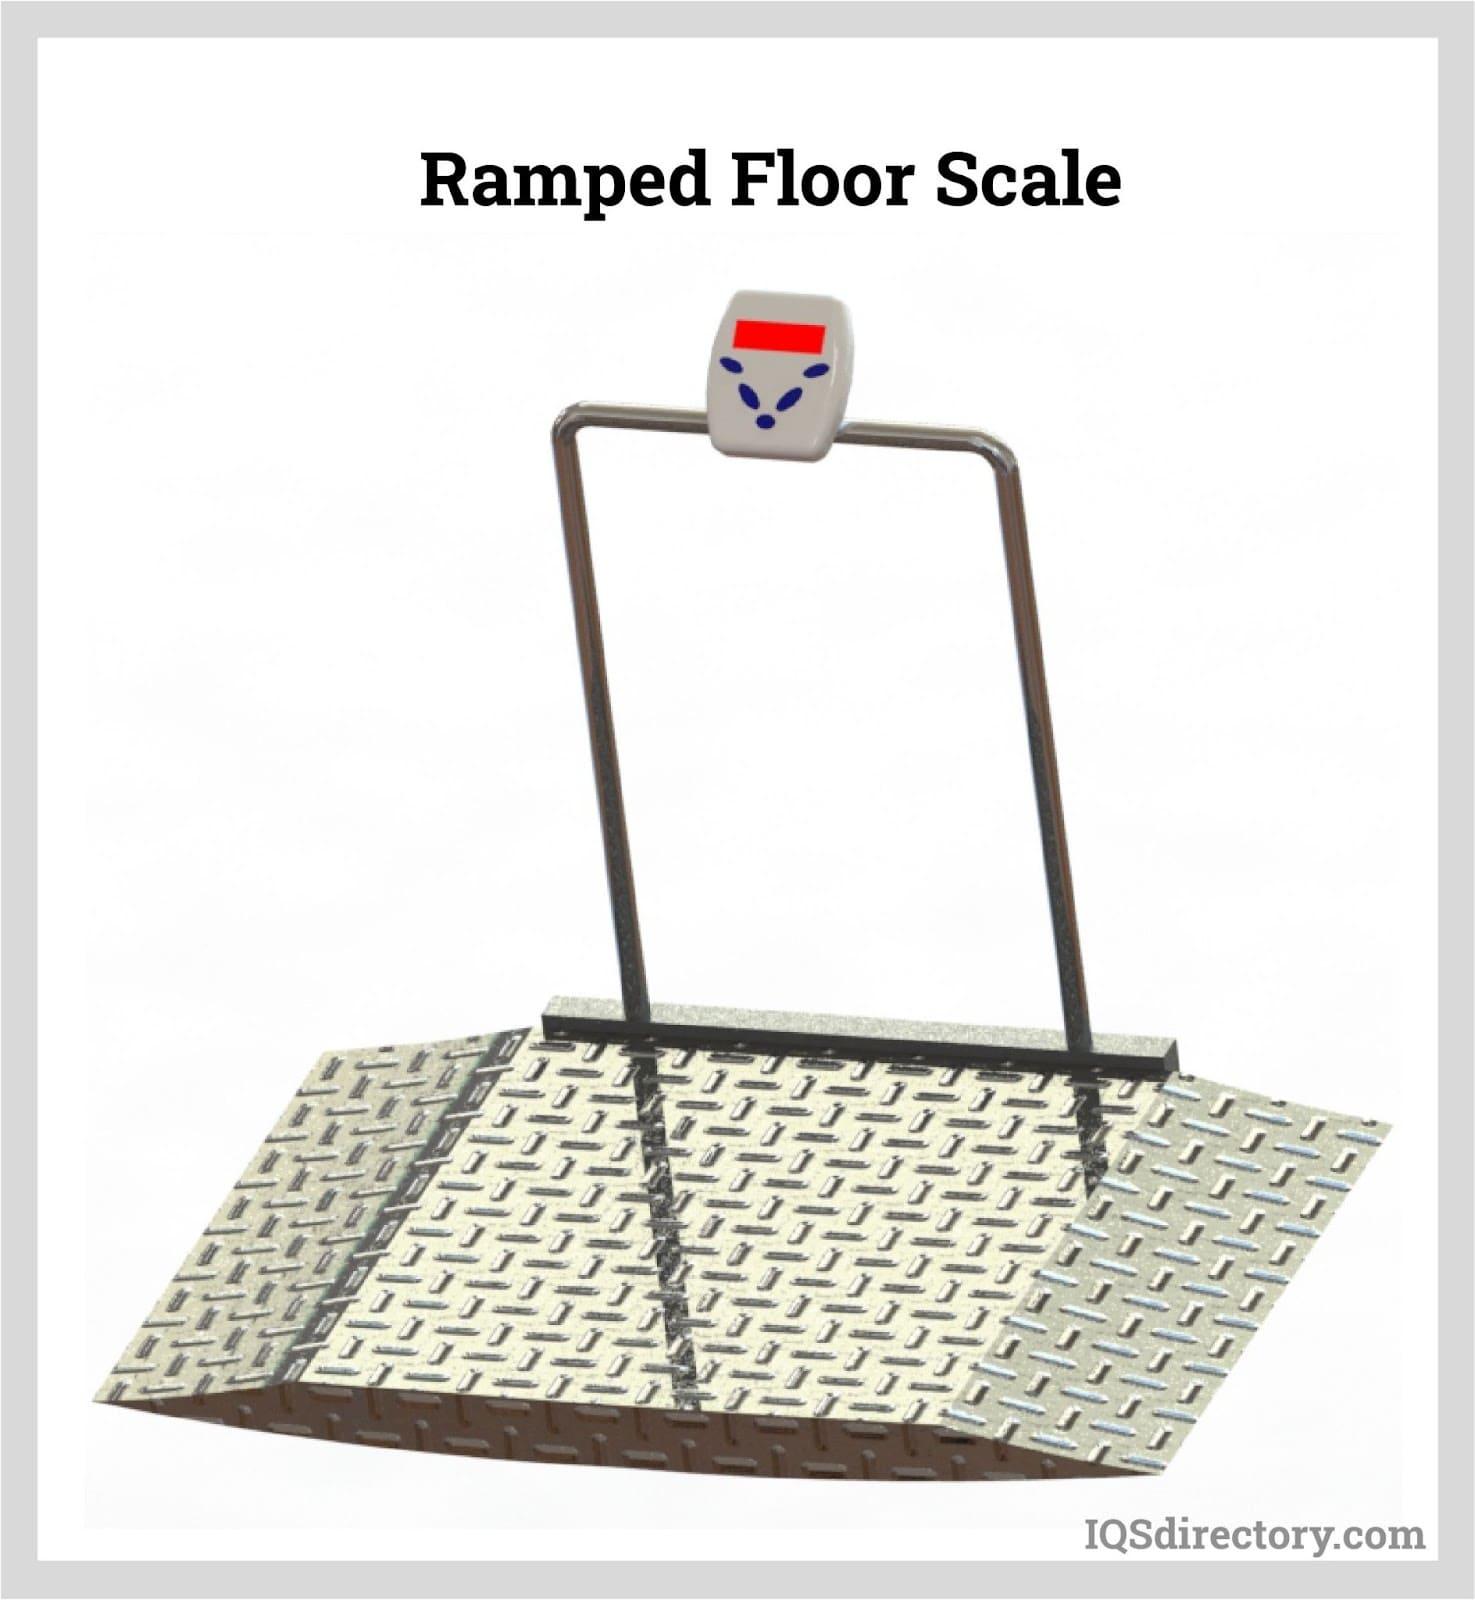 Ramped Floor Scale